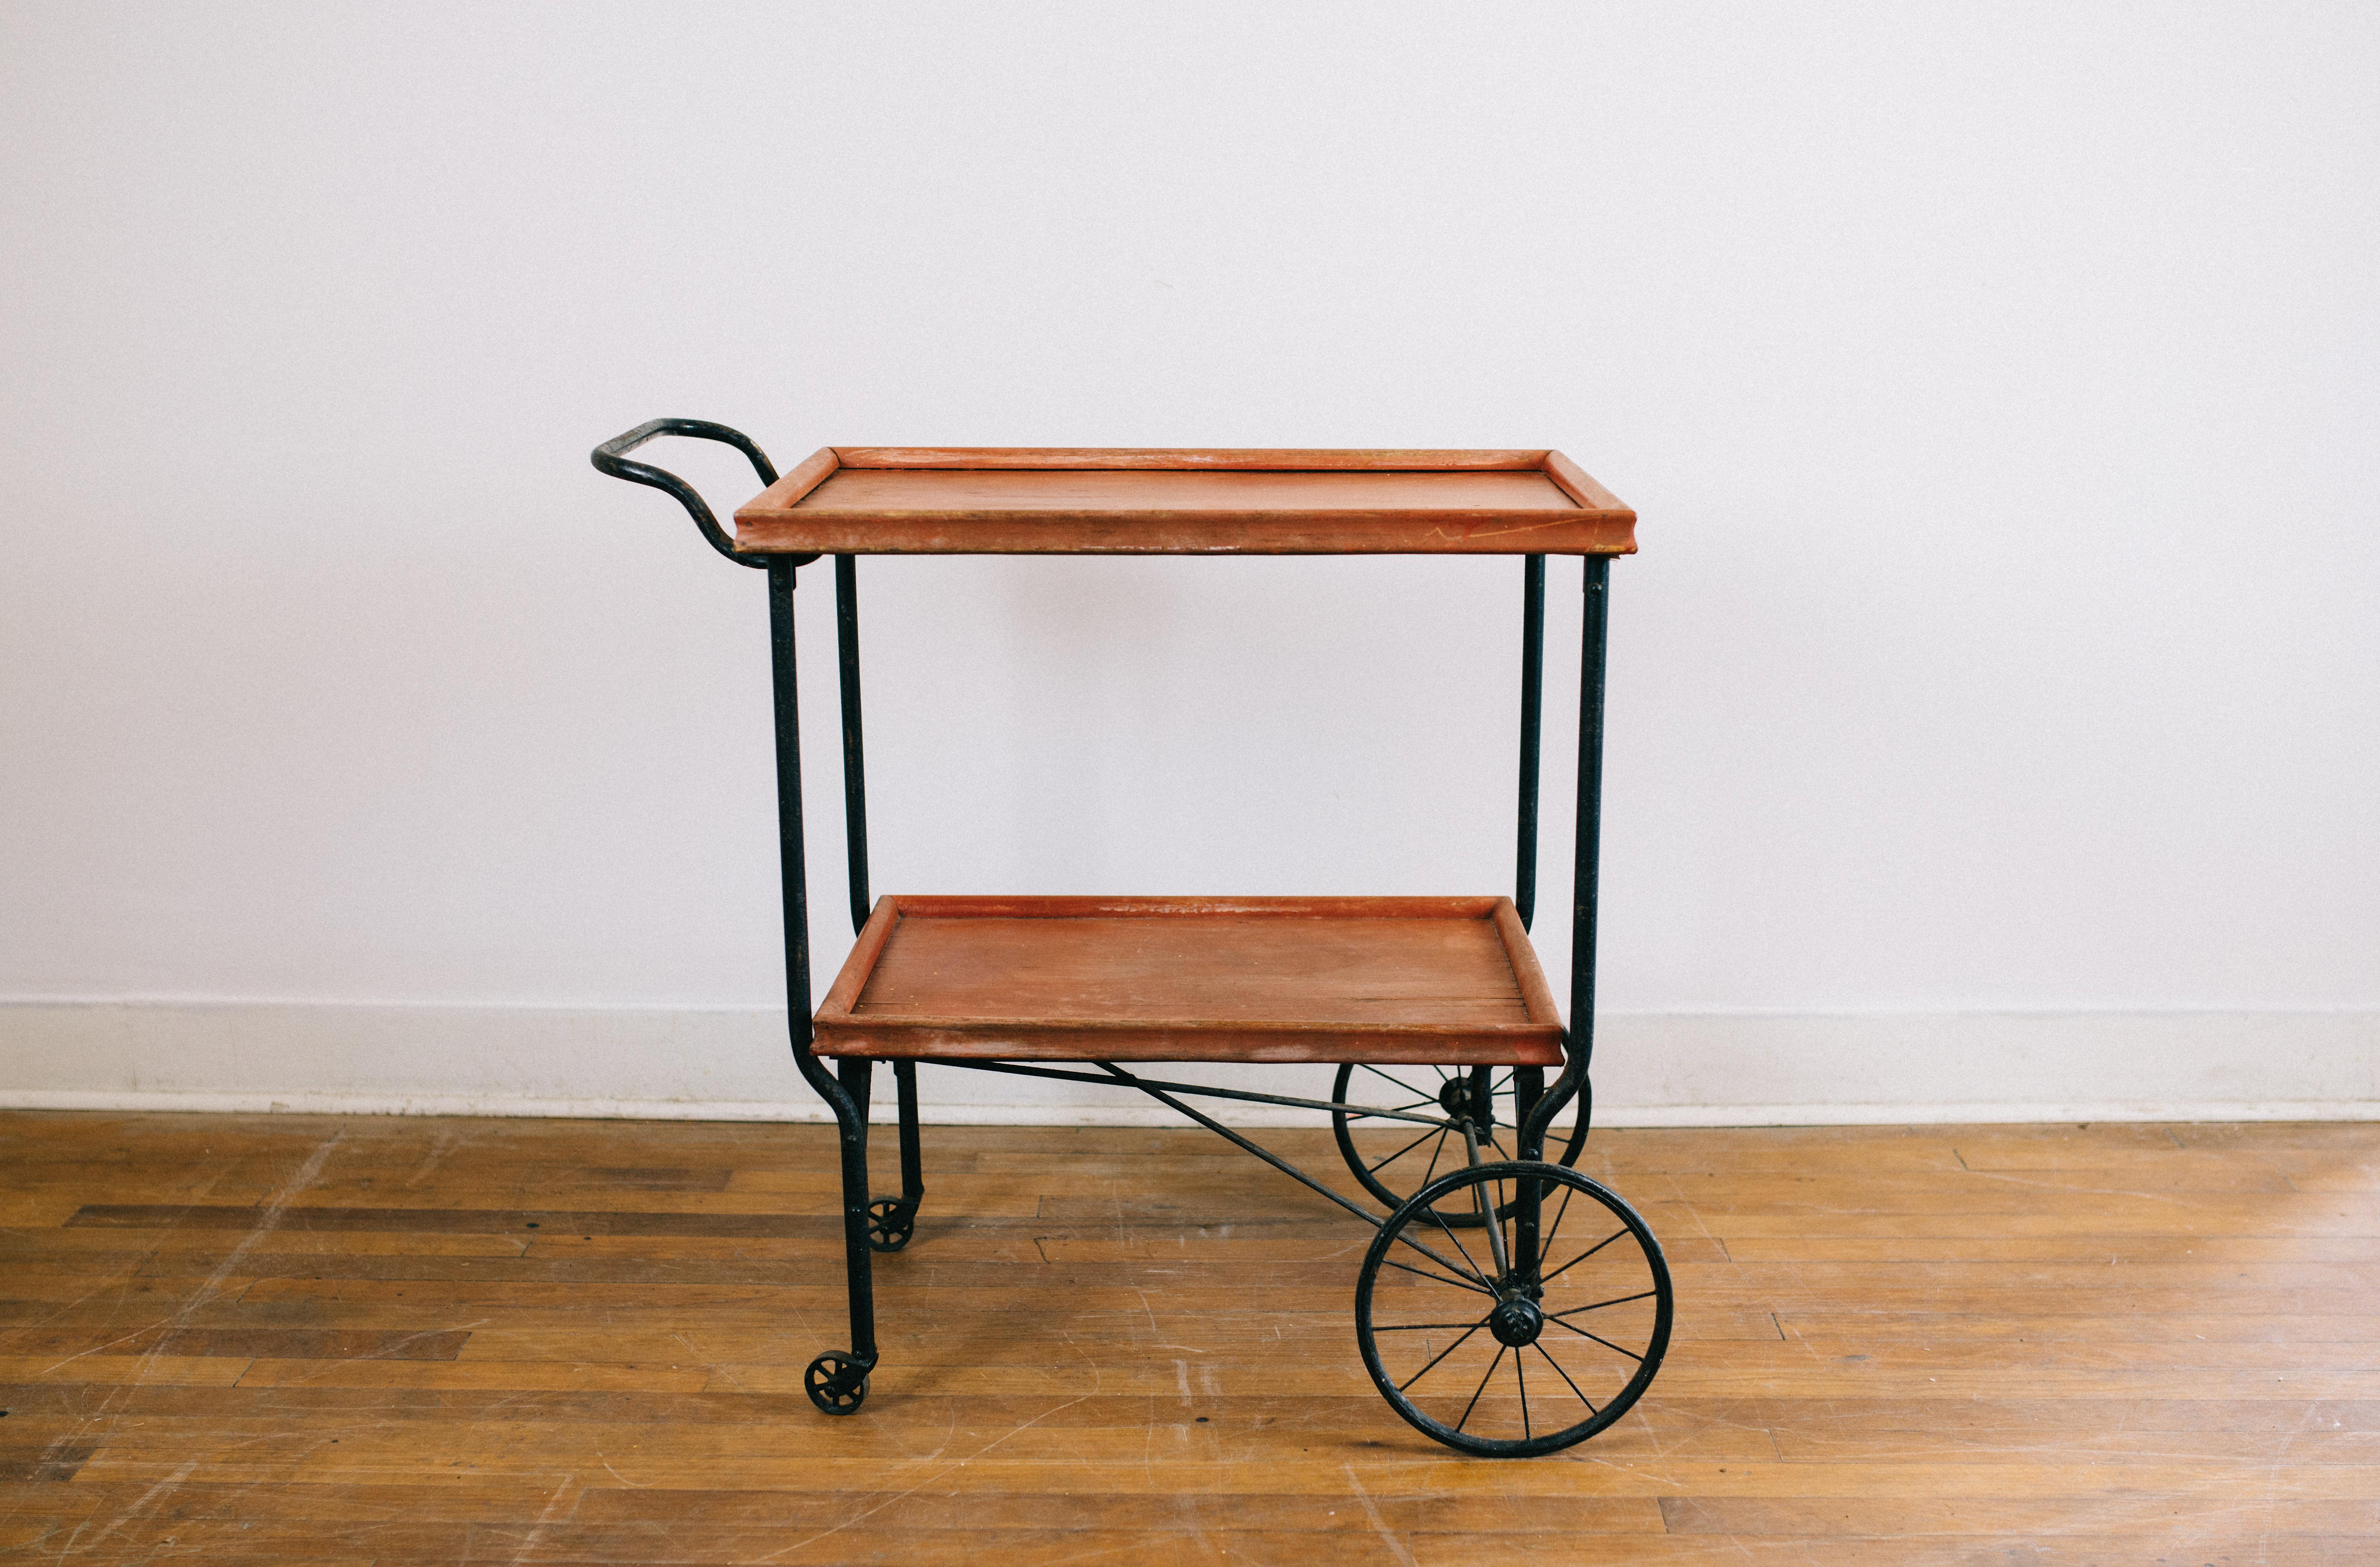 Vintage Metal Kitchen Cart Specialty Vintage Wedding Party Rentals New Orleans Events